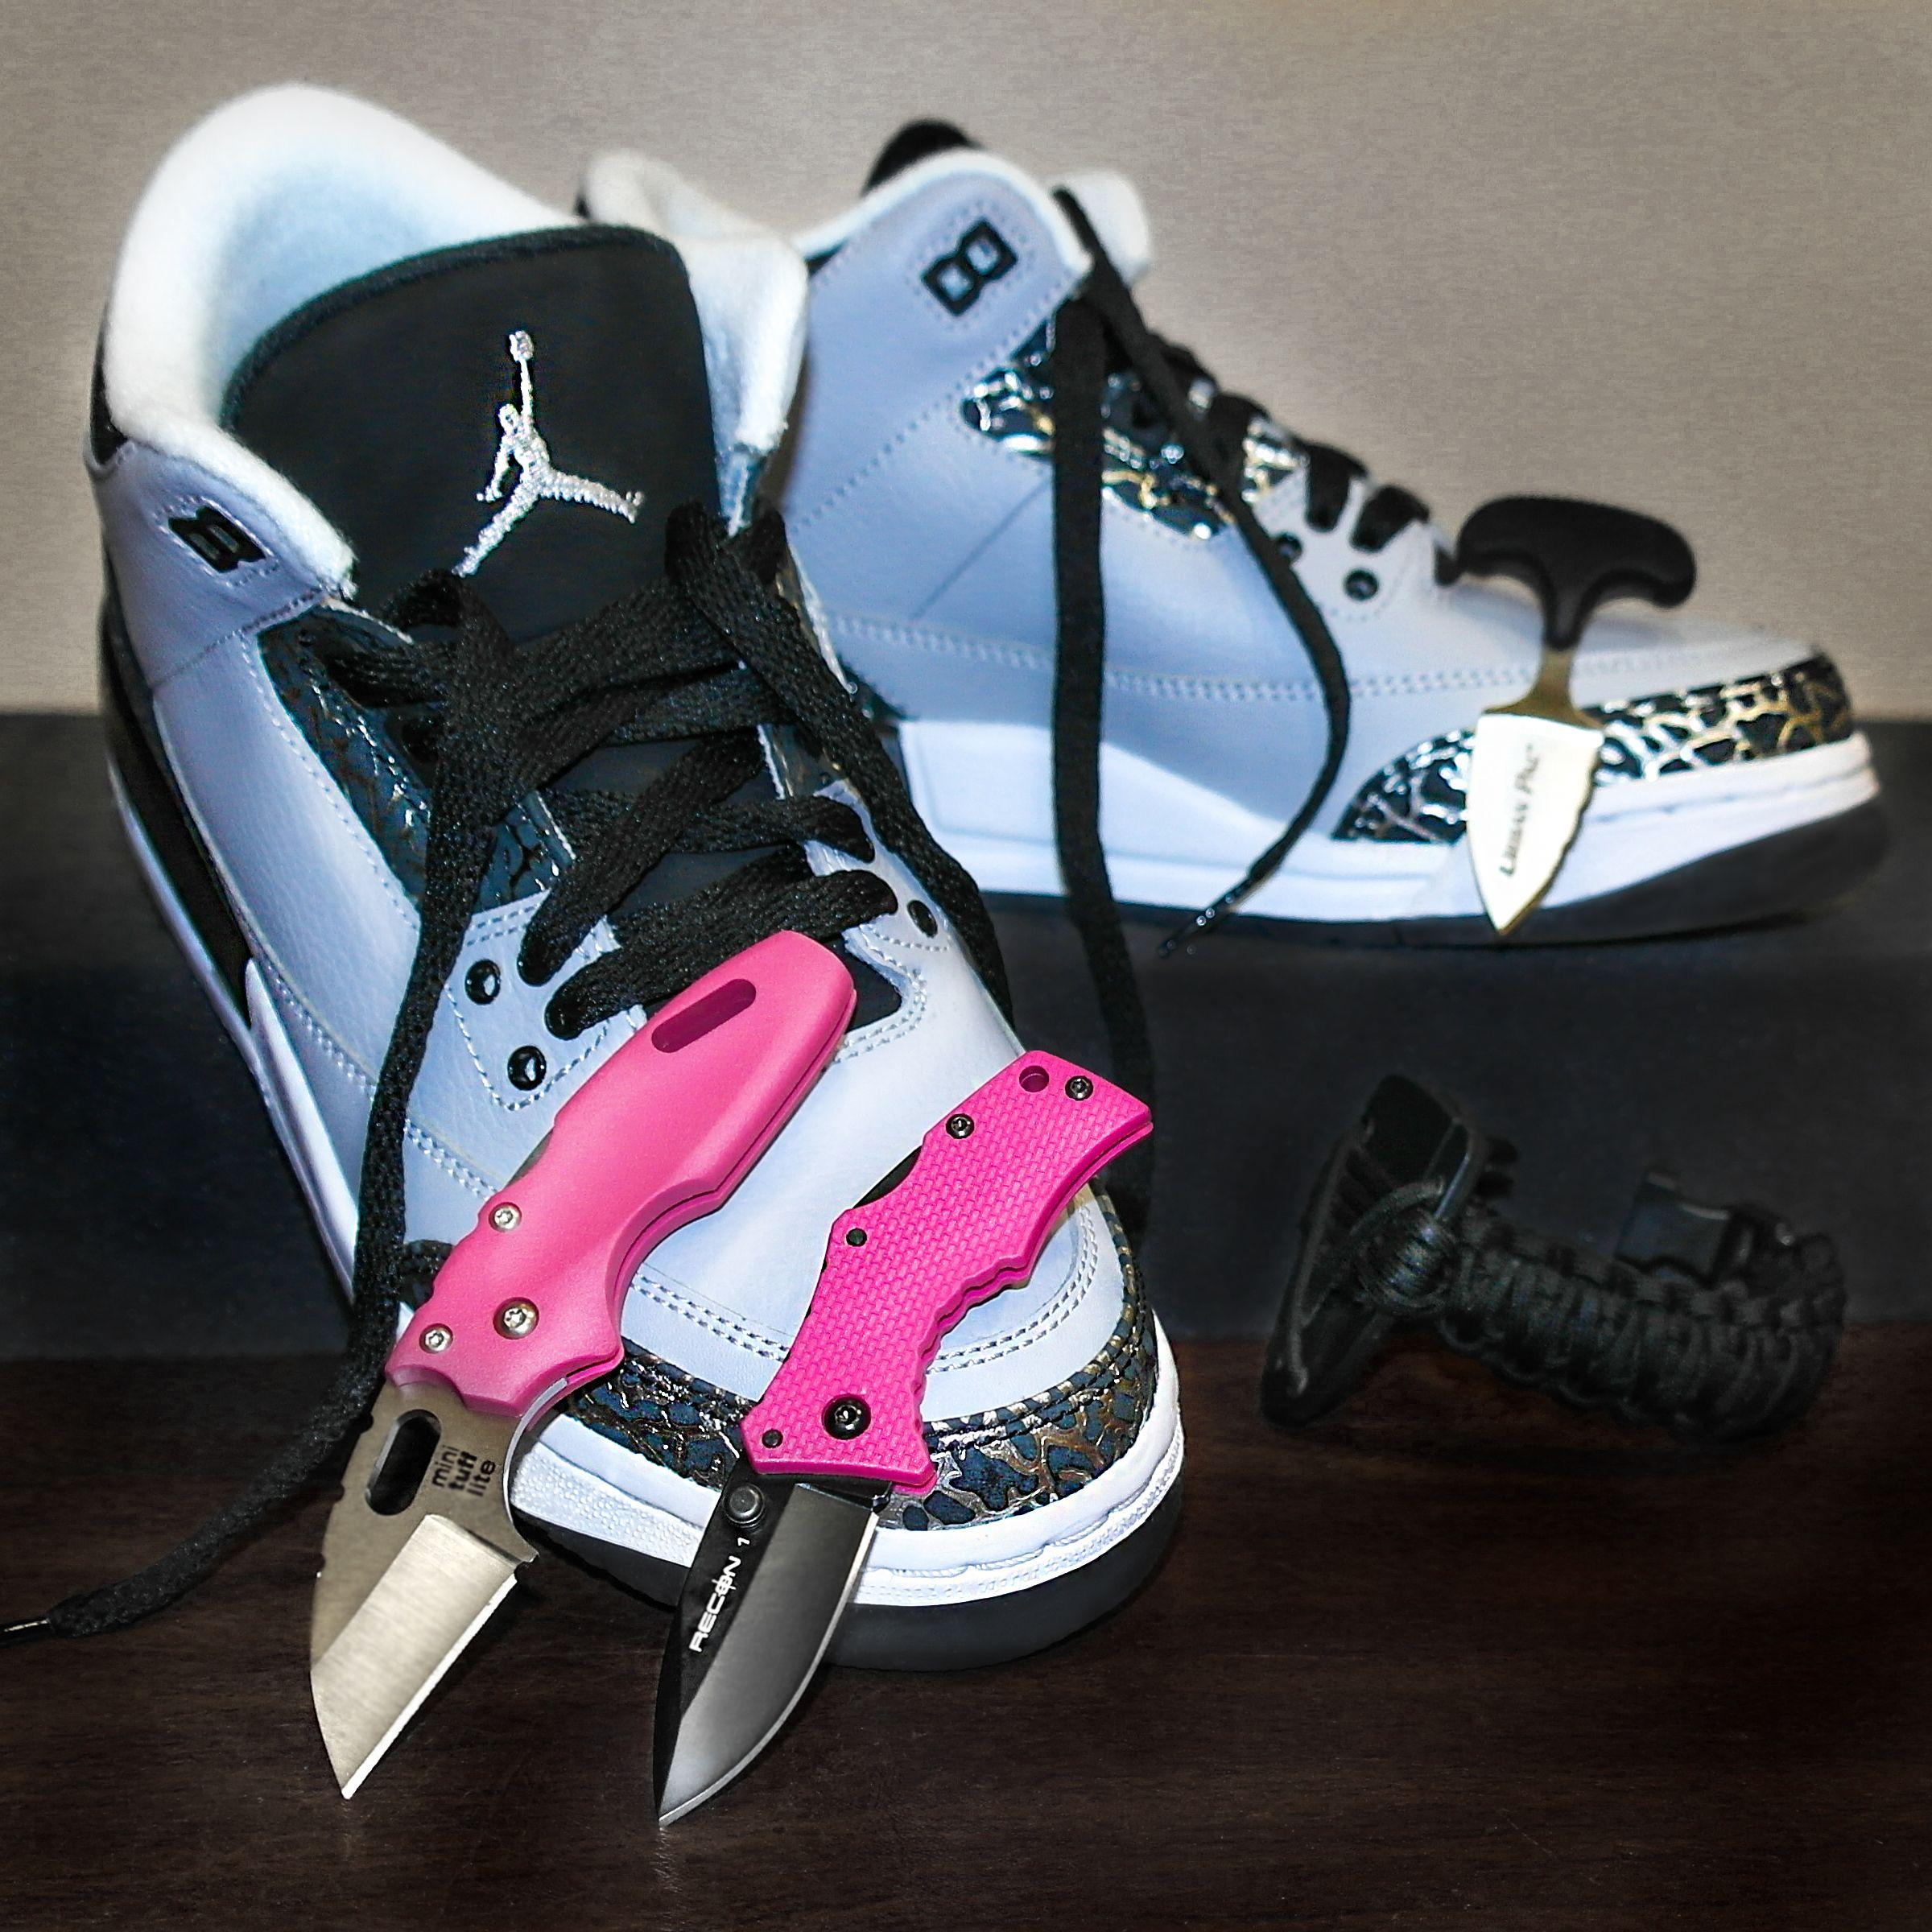 Cold Steel Crew Member EDC Mini Tuff-Lite, Micron Recon 1 & Urban Pal · Jordan  ShoesCold ...